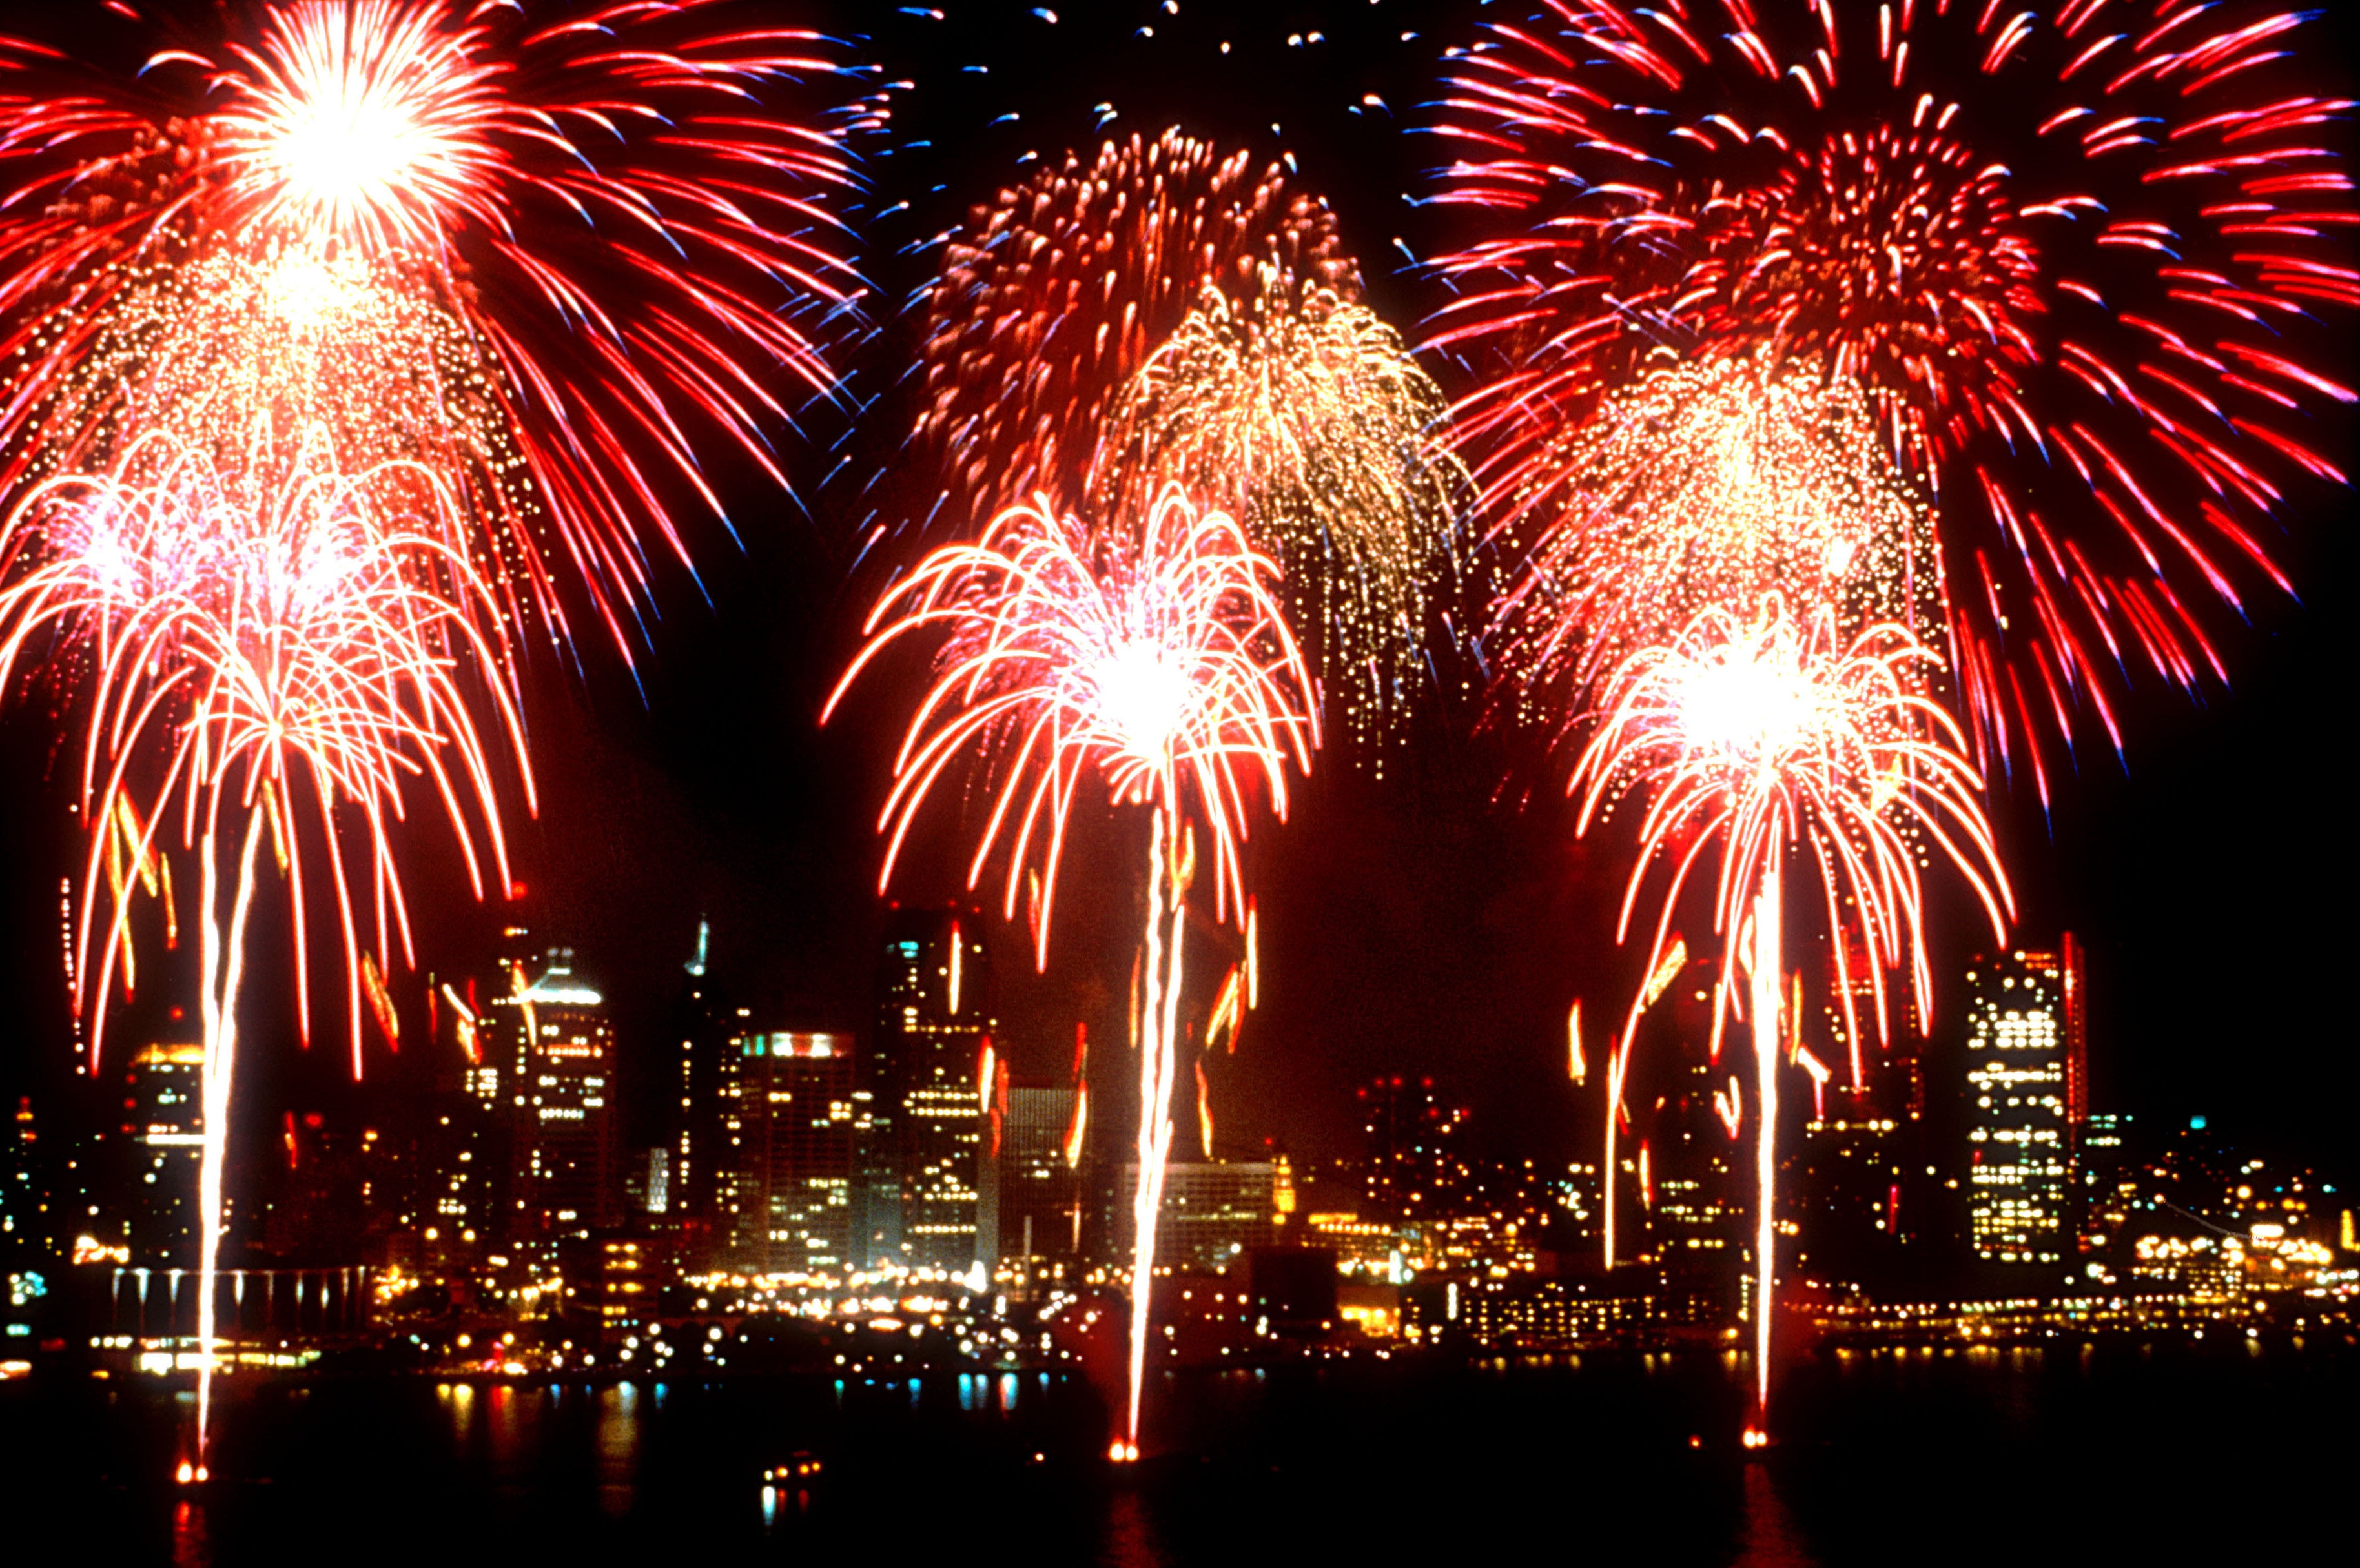 http://upload.wikimedia.org/wikipedia/commons/7/7f/Fireworks_DetroitWindsorIntlFreedomFest.jpg